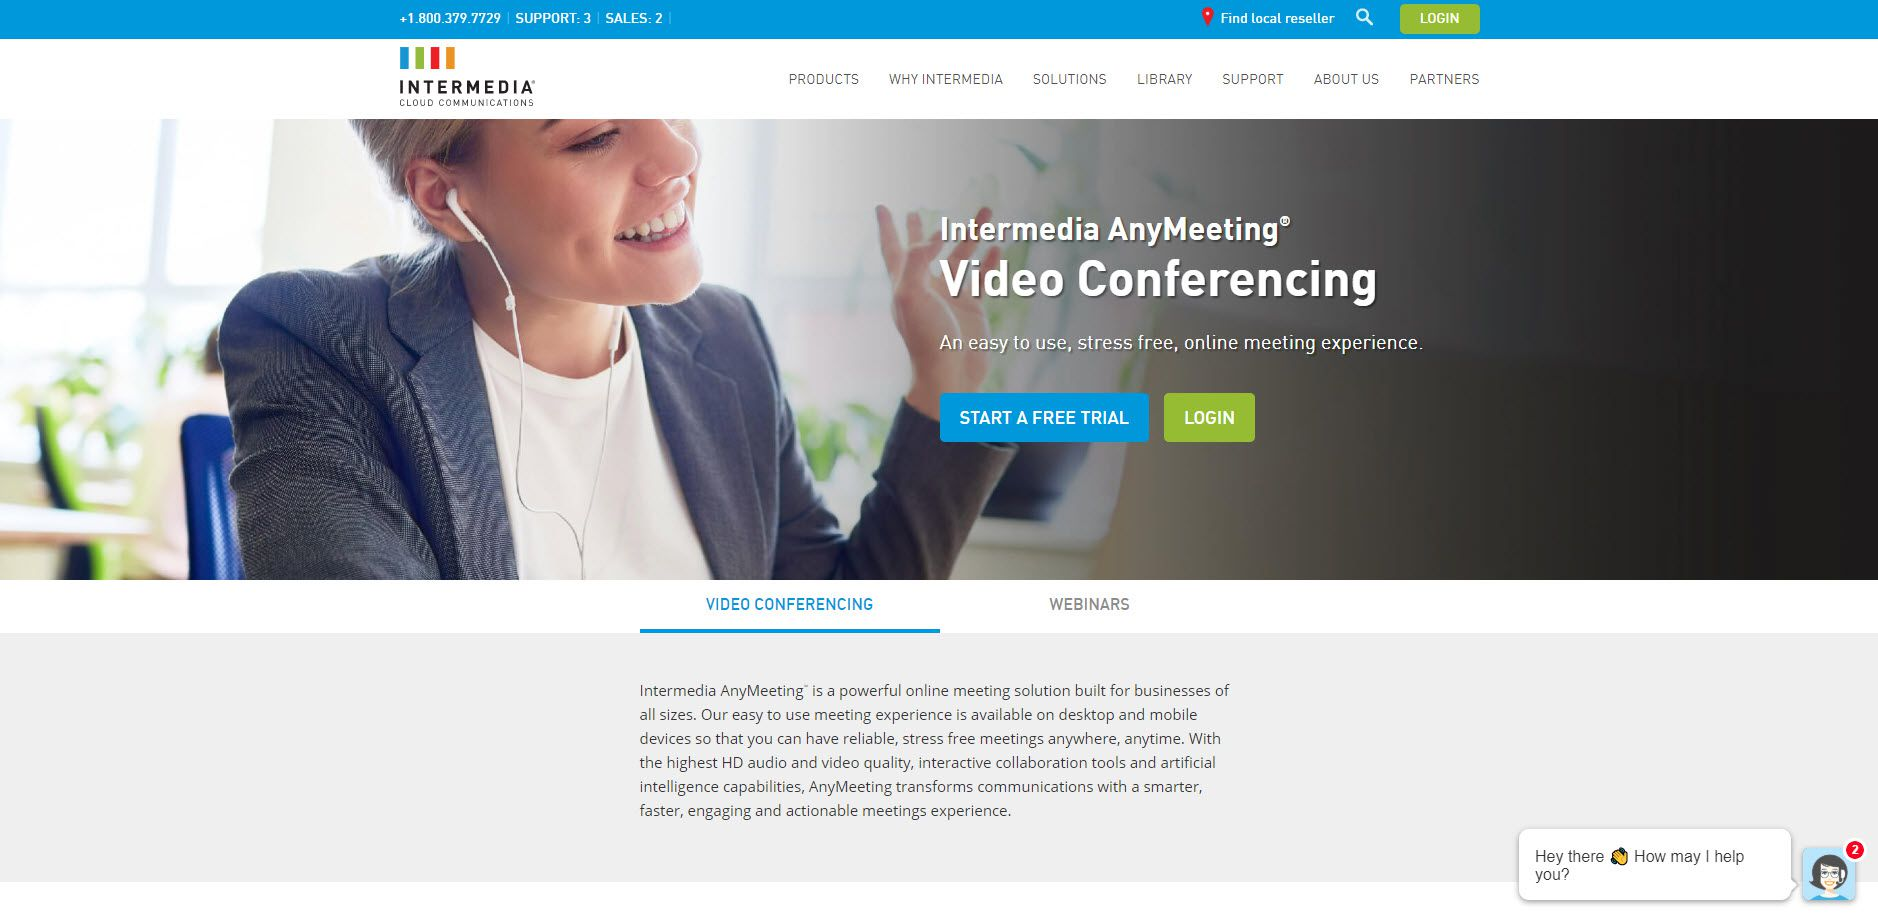 A screenshot of the Intermedia AnyMeeting website.